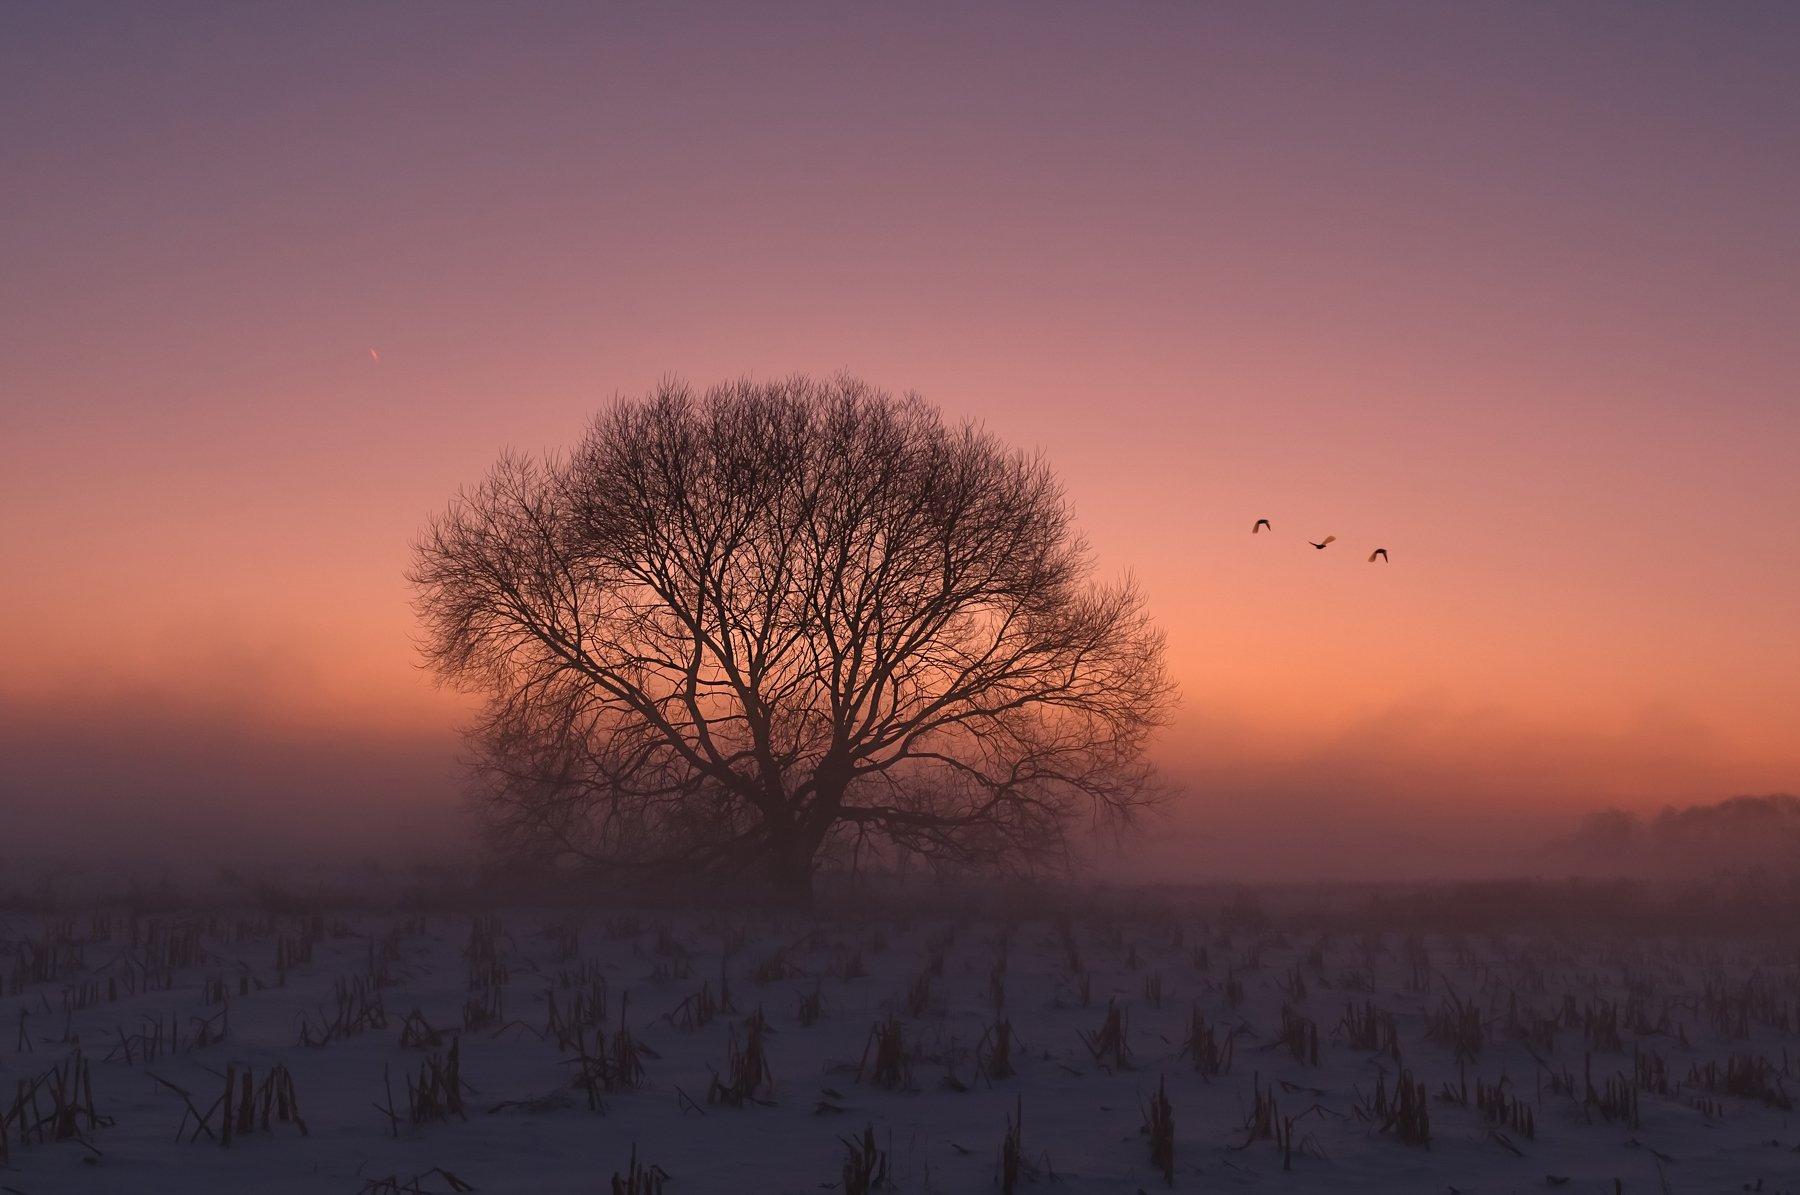 зима, закат, свислочь, беларусь, туман, Александр Гвоздь